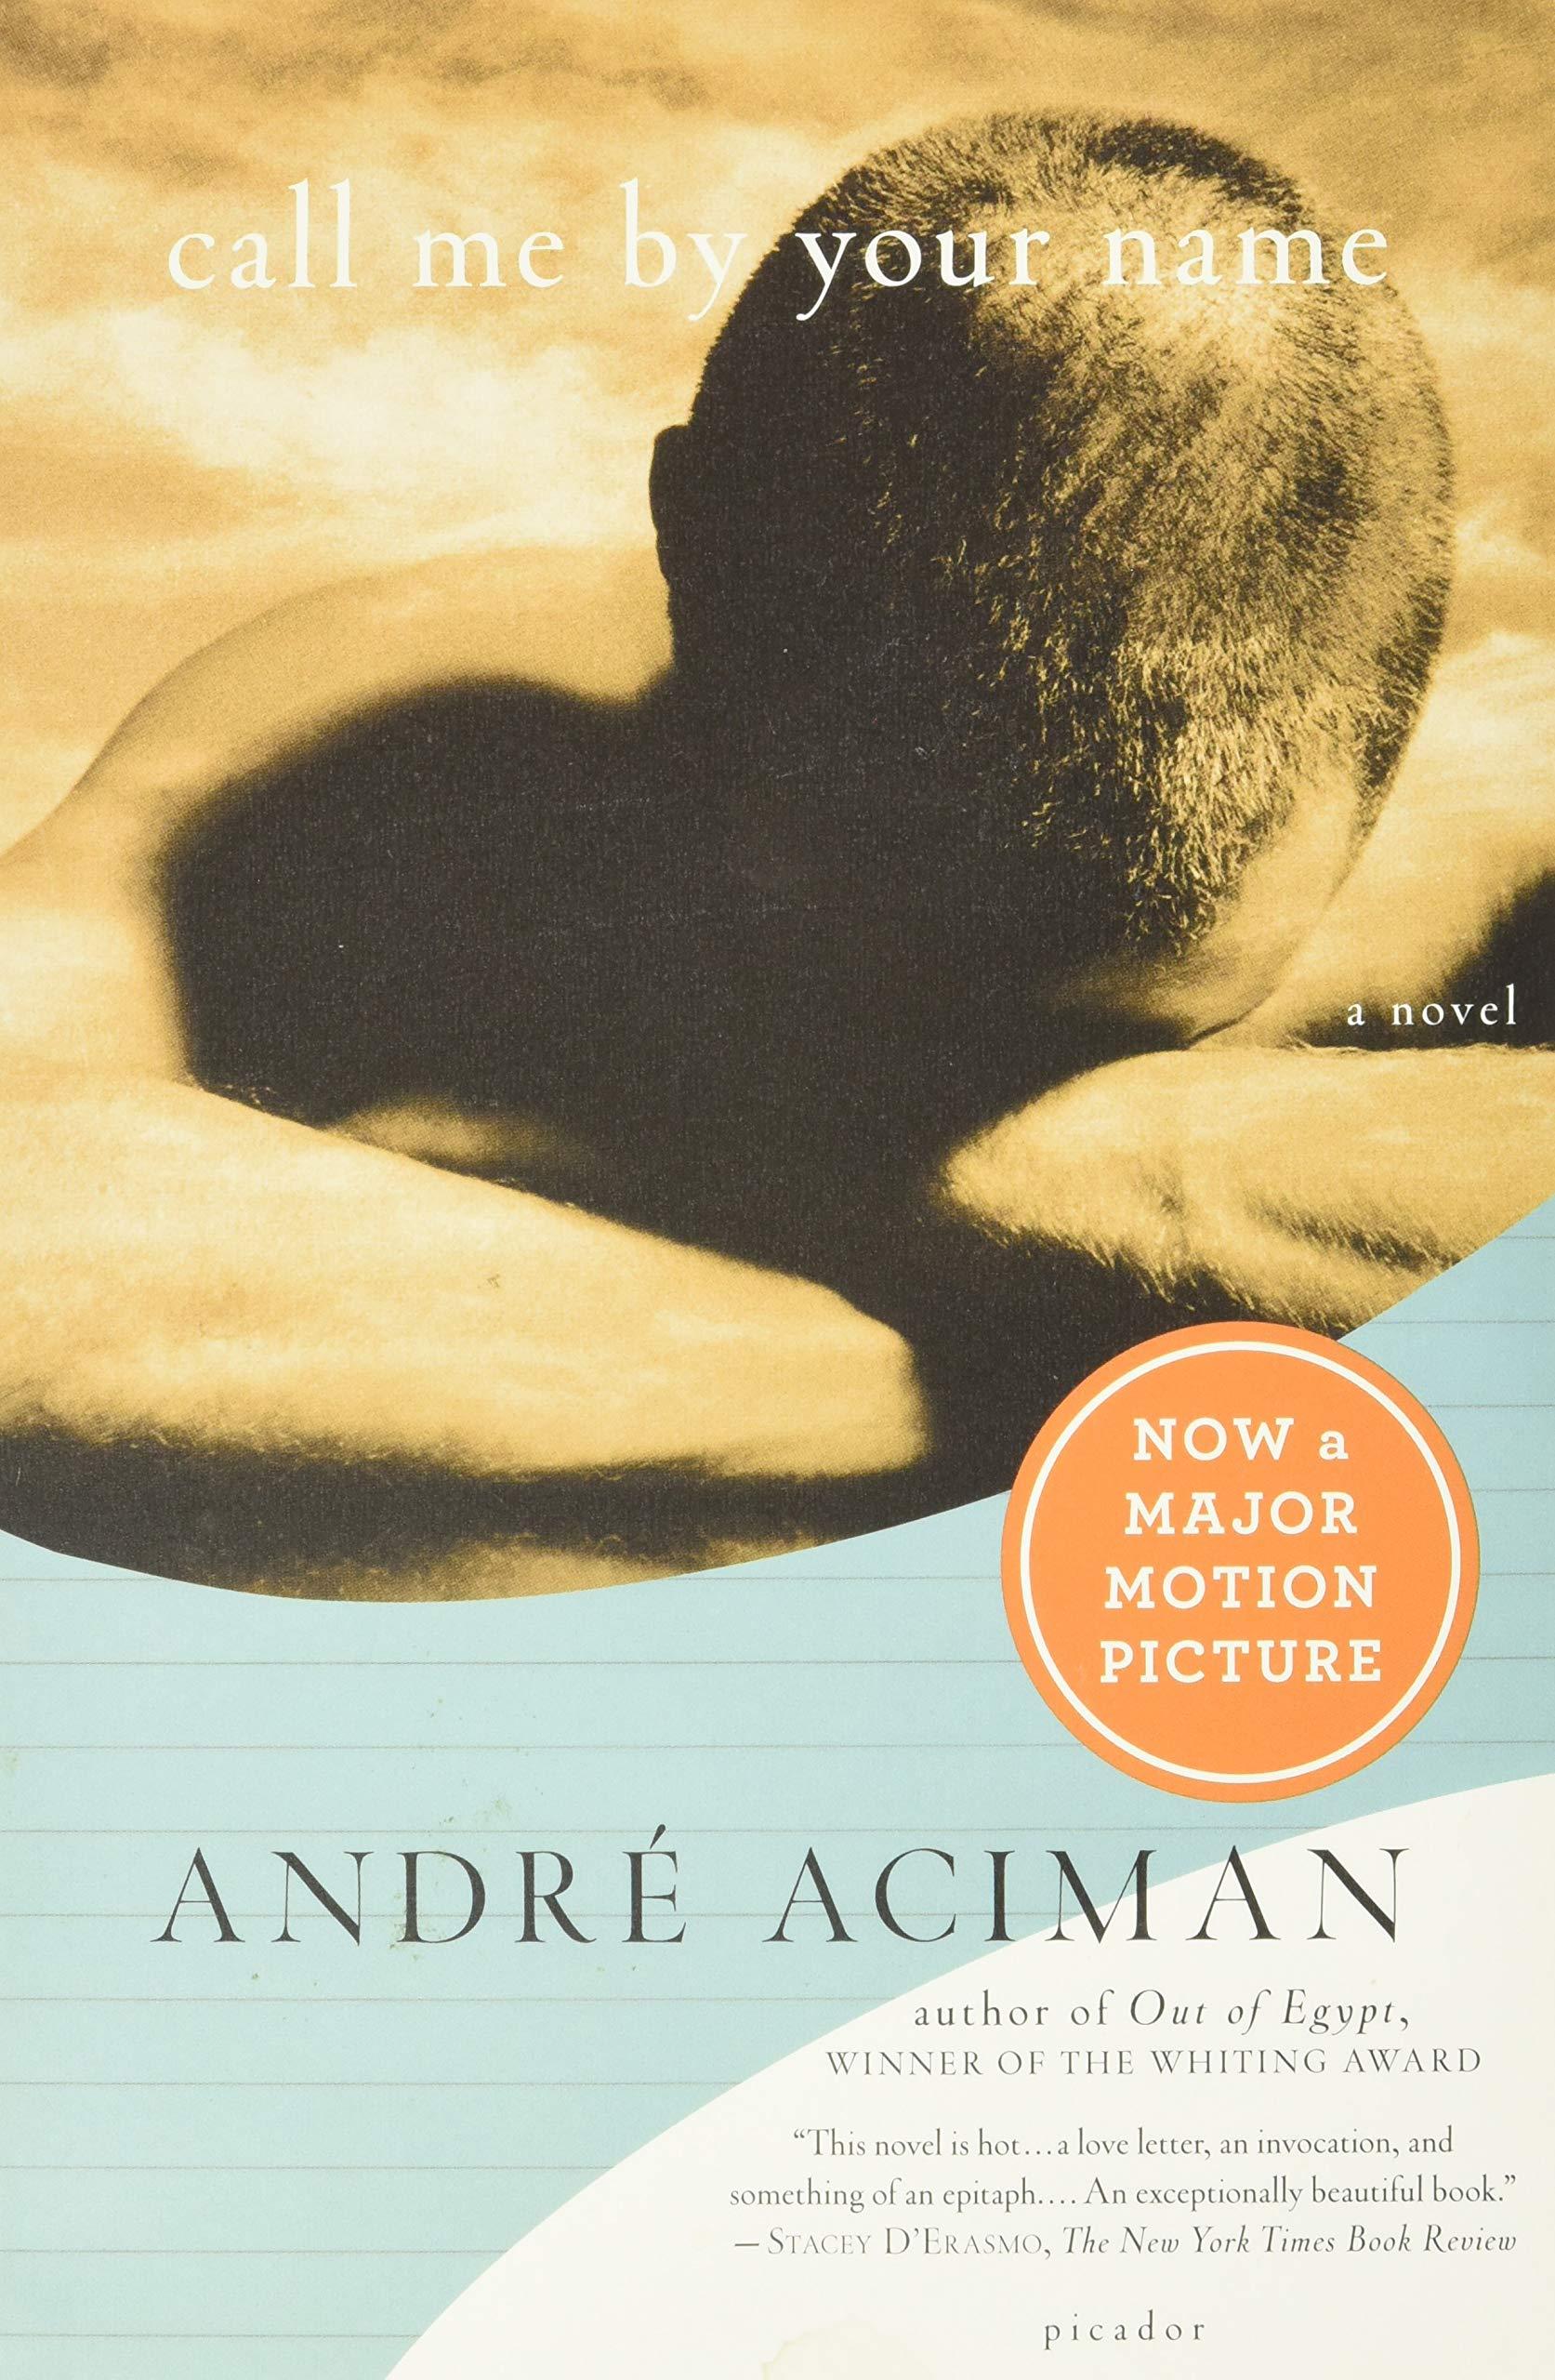 Amazon.com: Call Me by Your Name: A Novel (9780312426781): André Aciman:  Books